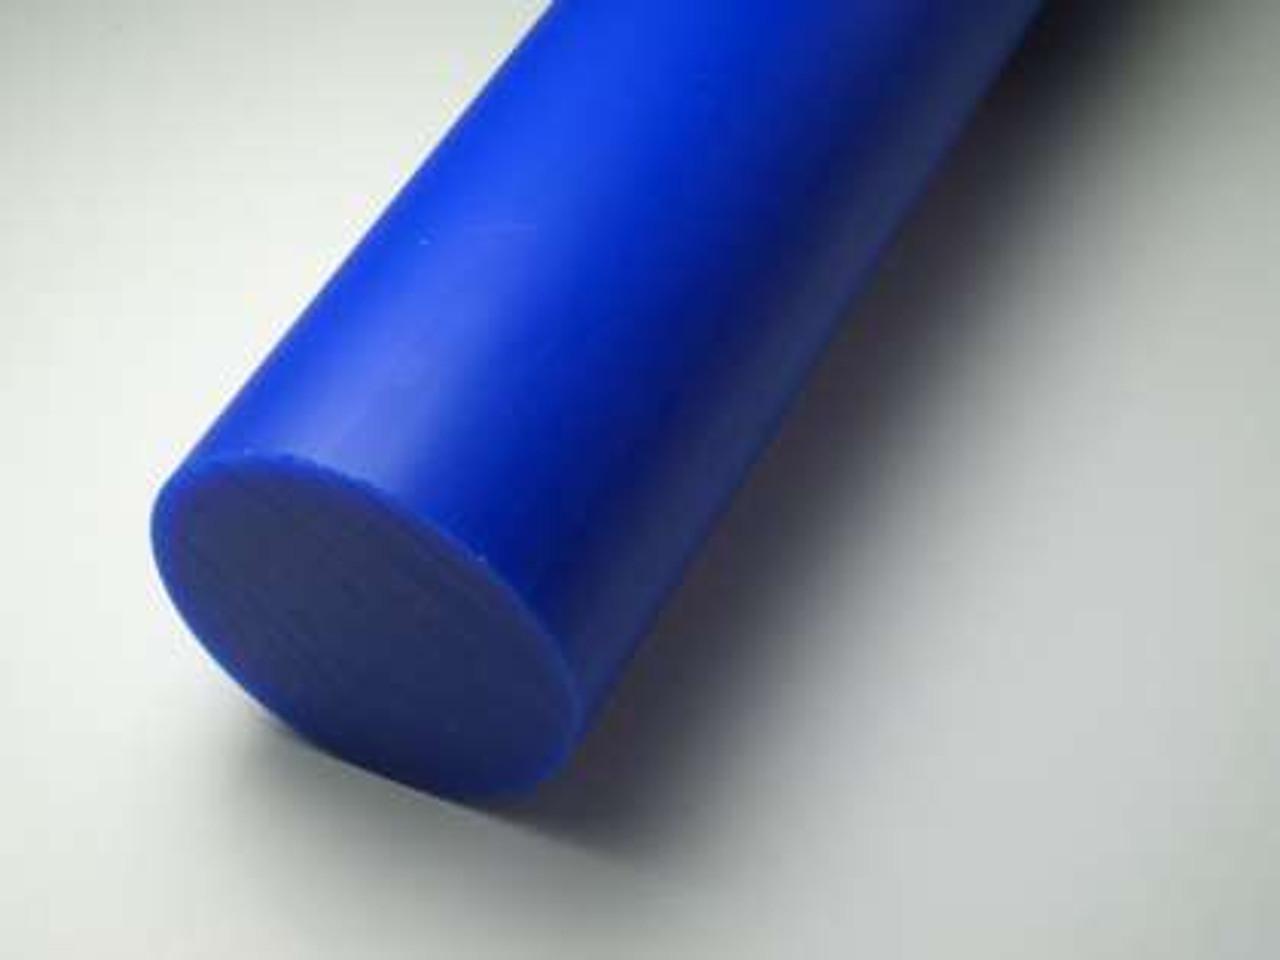 3 inch (76mm) diameter x 12 inch (304mm) long